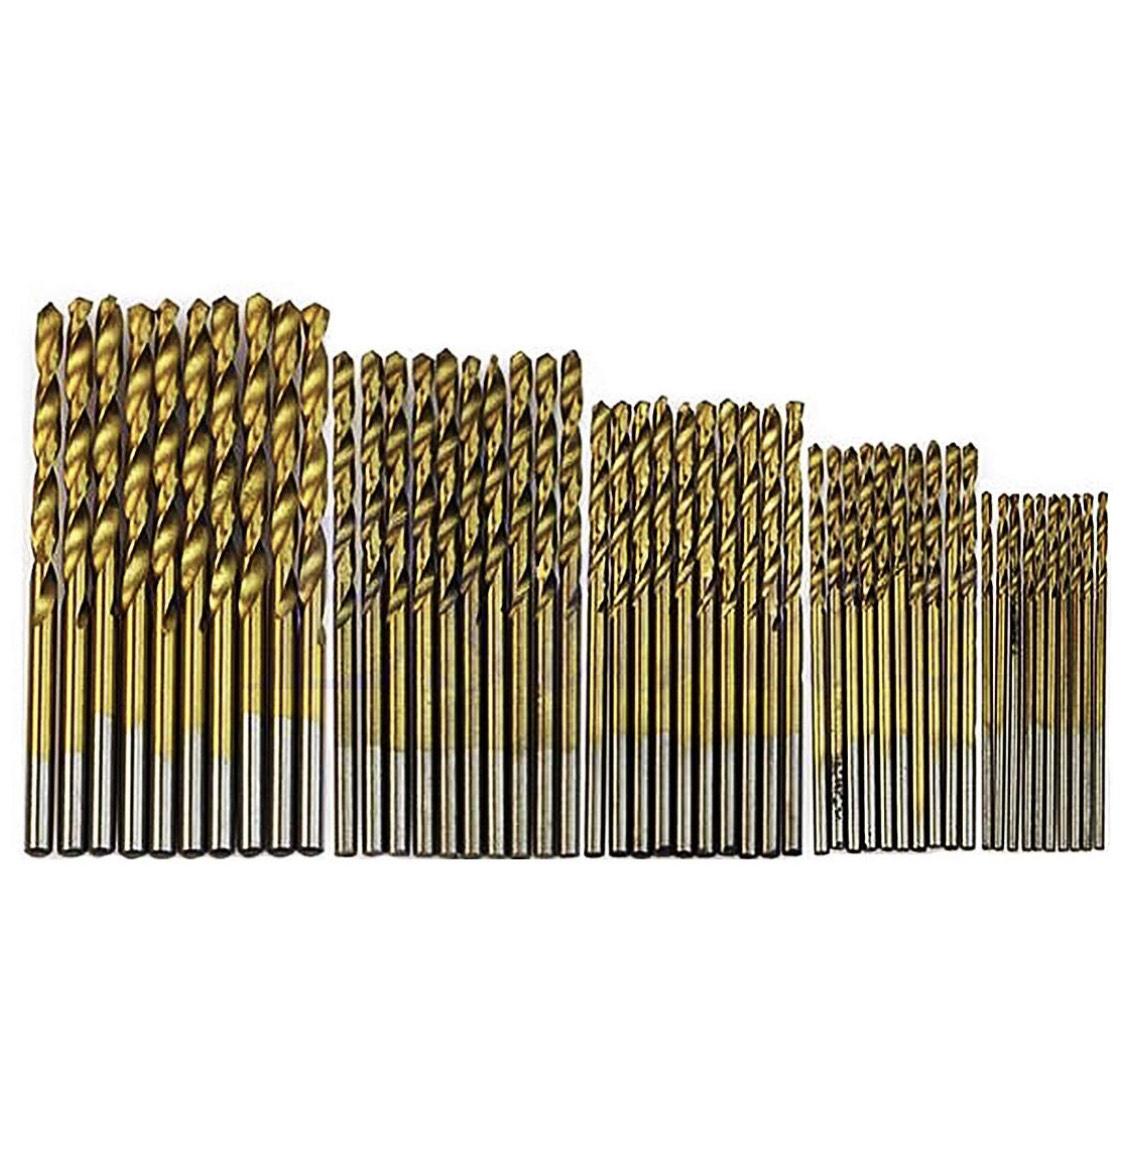 Juego de 50 brocas, para carpintería